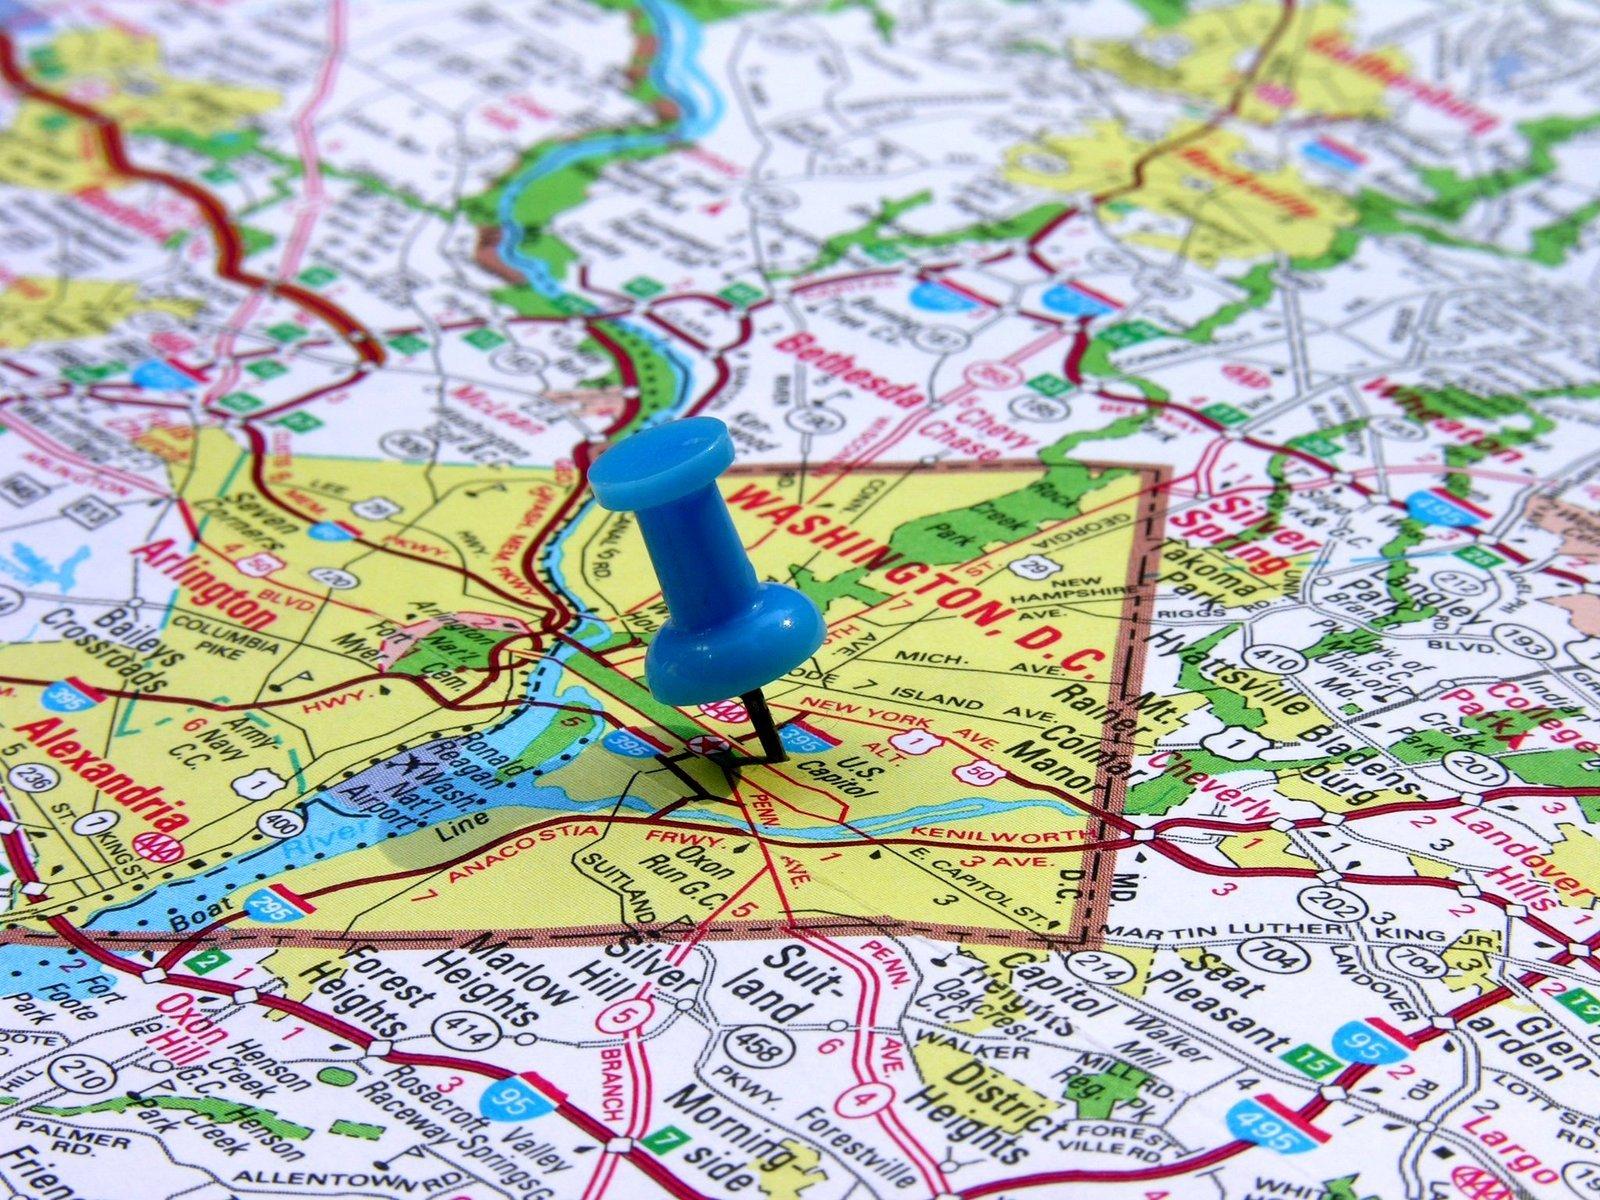 washington-dc-on-the-map-1-1557529.jpg